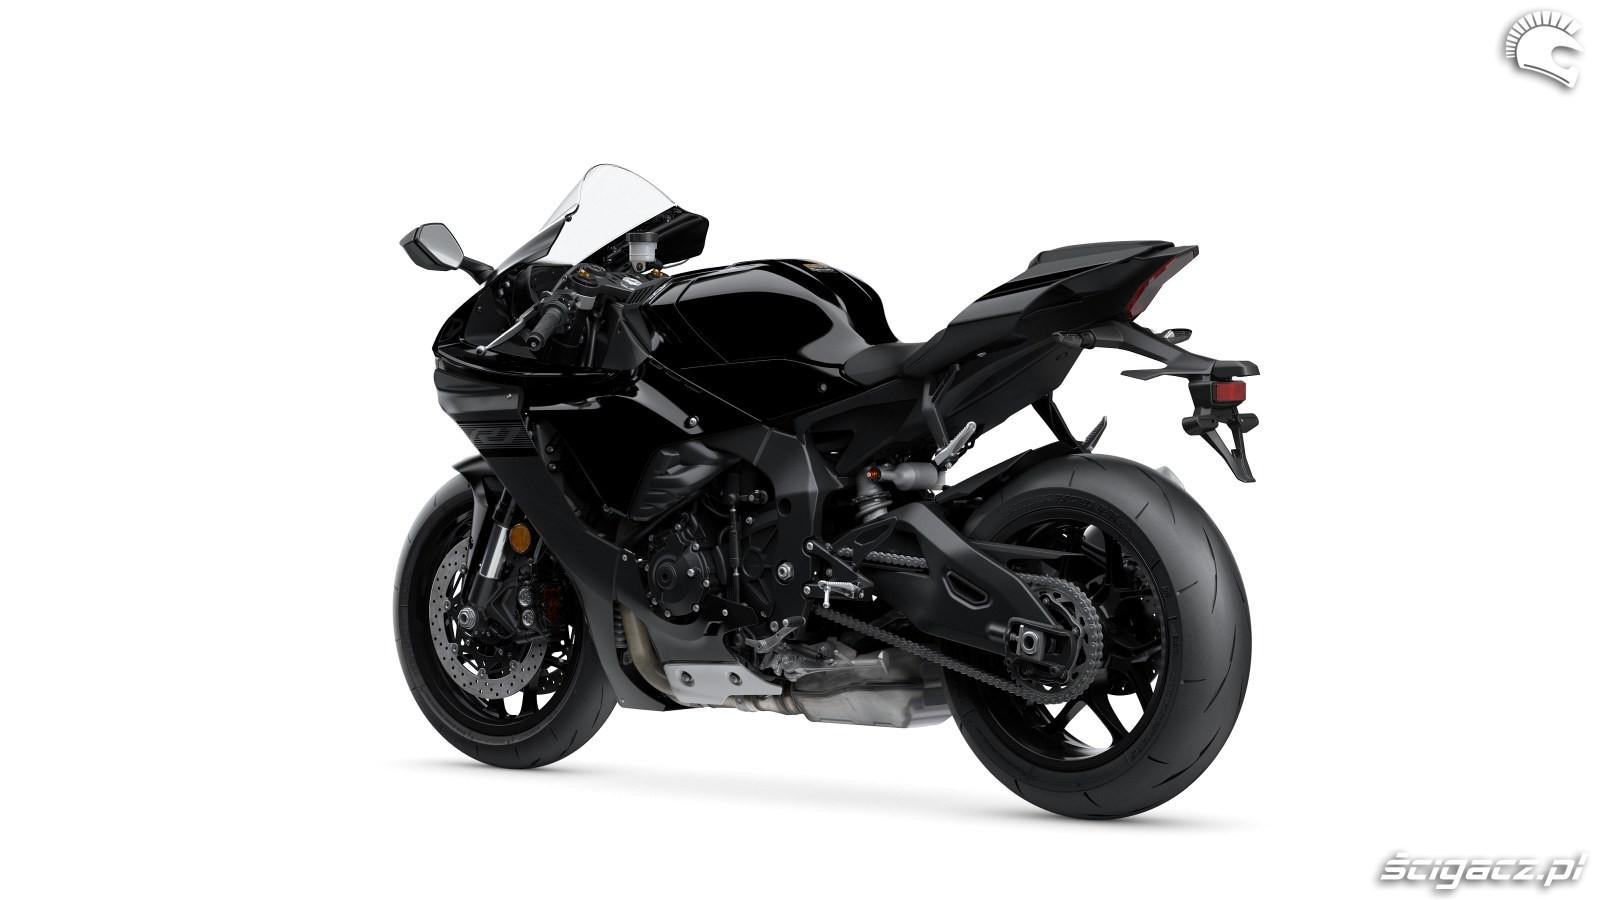 107 Yamaha R1 2020 studio 9